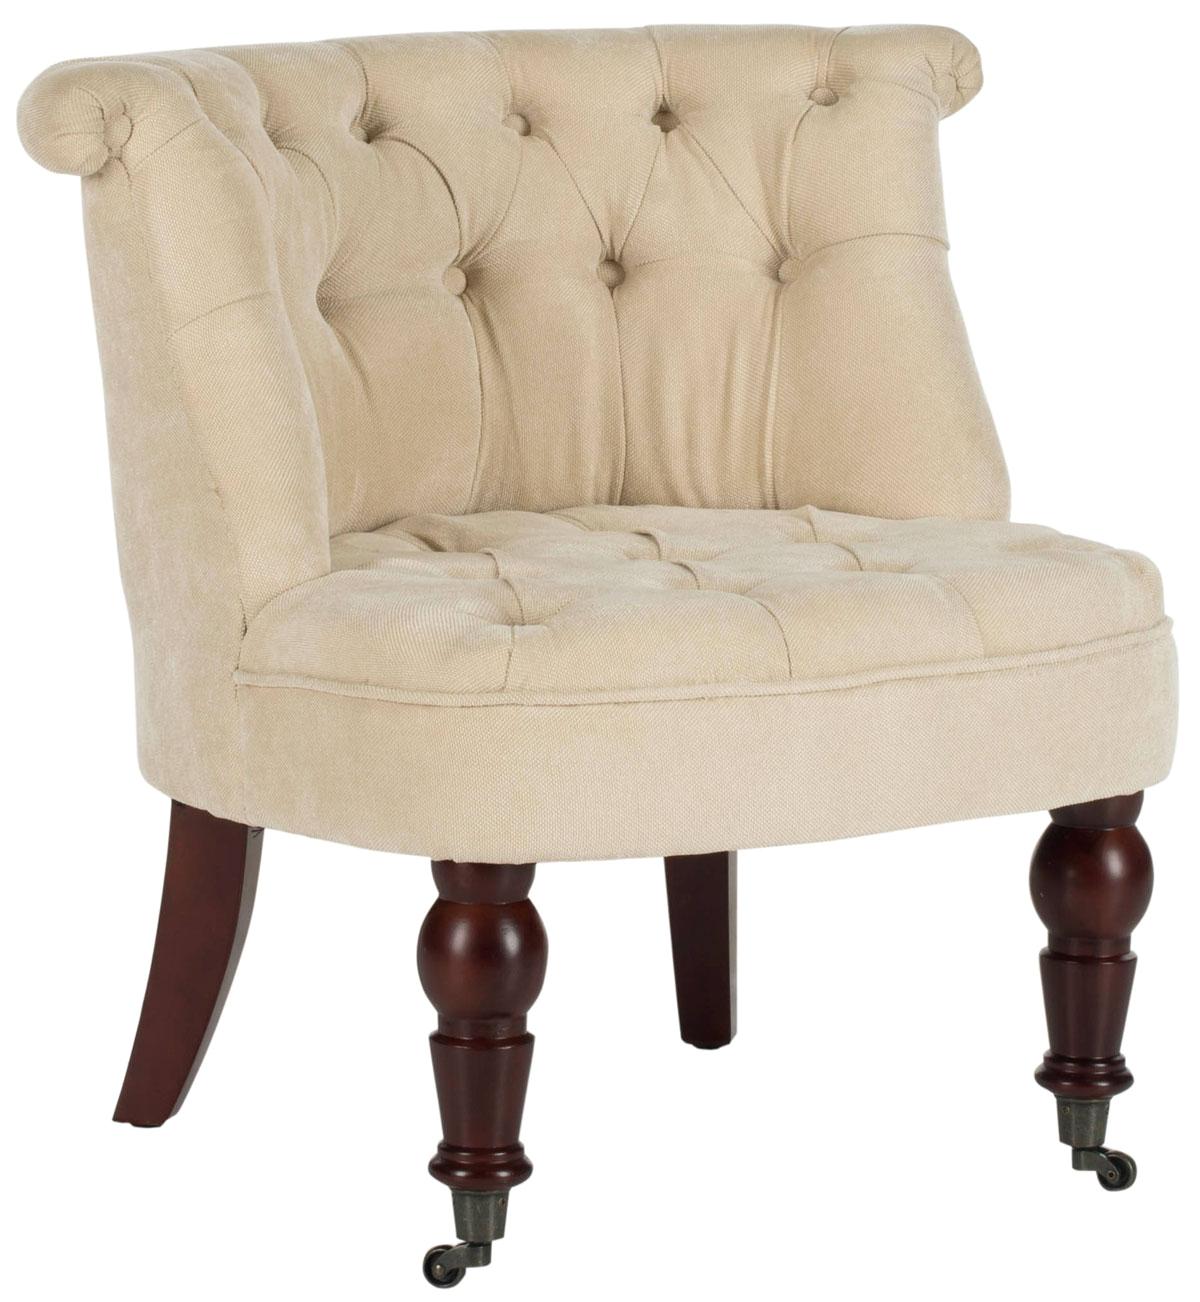 Safavieh Mercer Blue Accent Chair Mcr4711a Accent Chairs Furniture by Safavieh